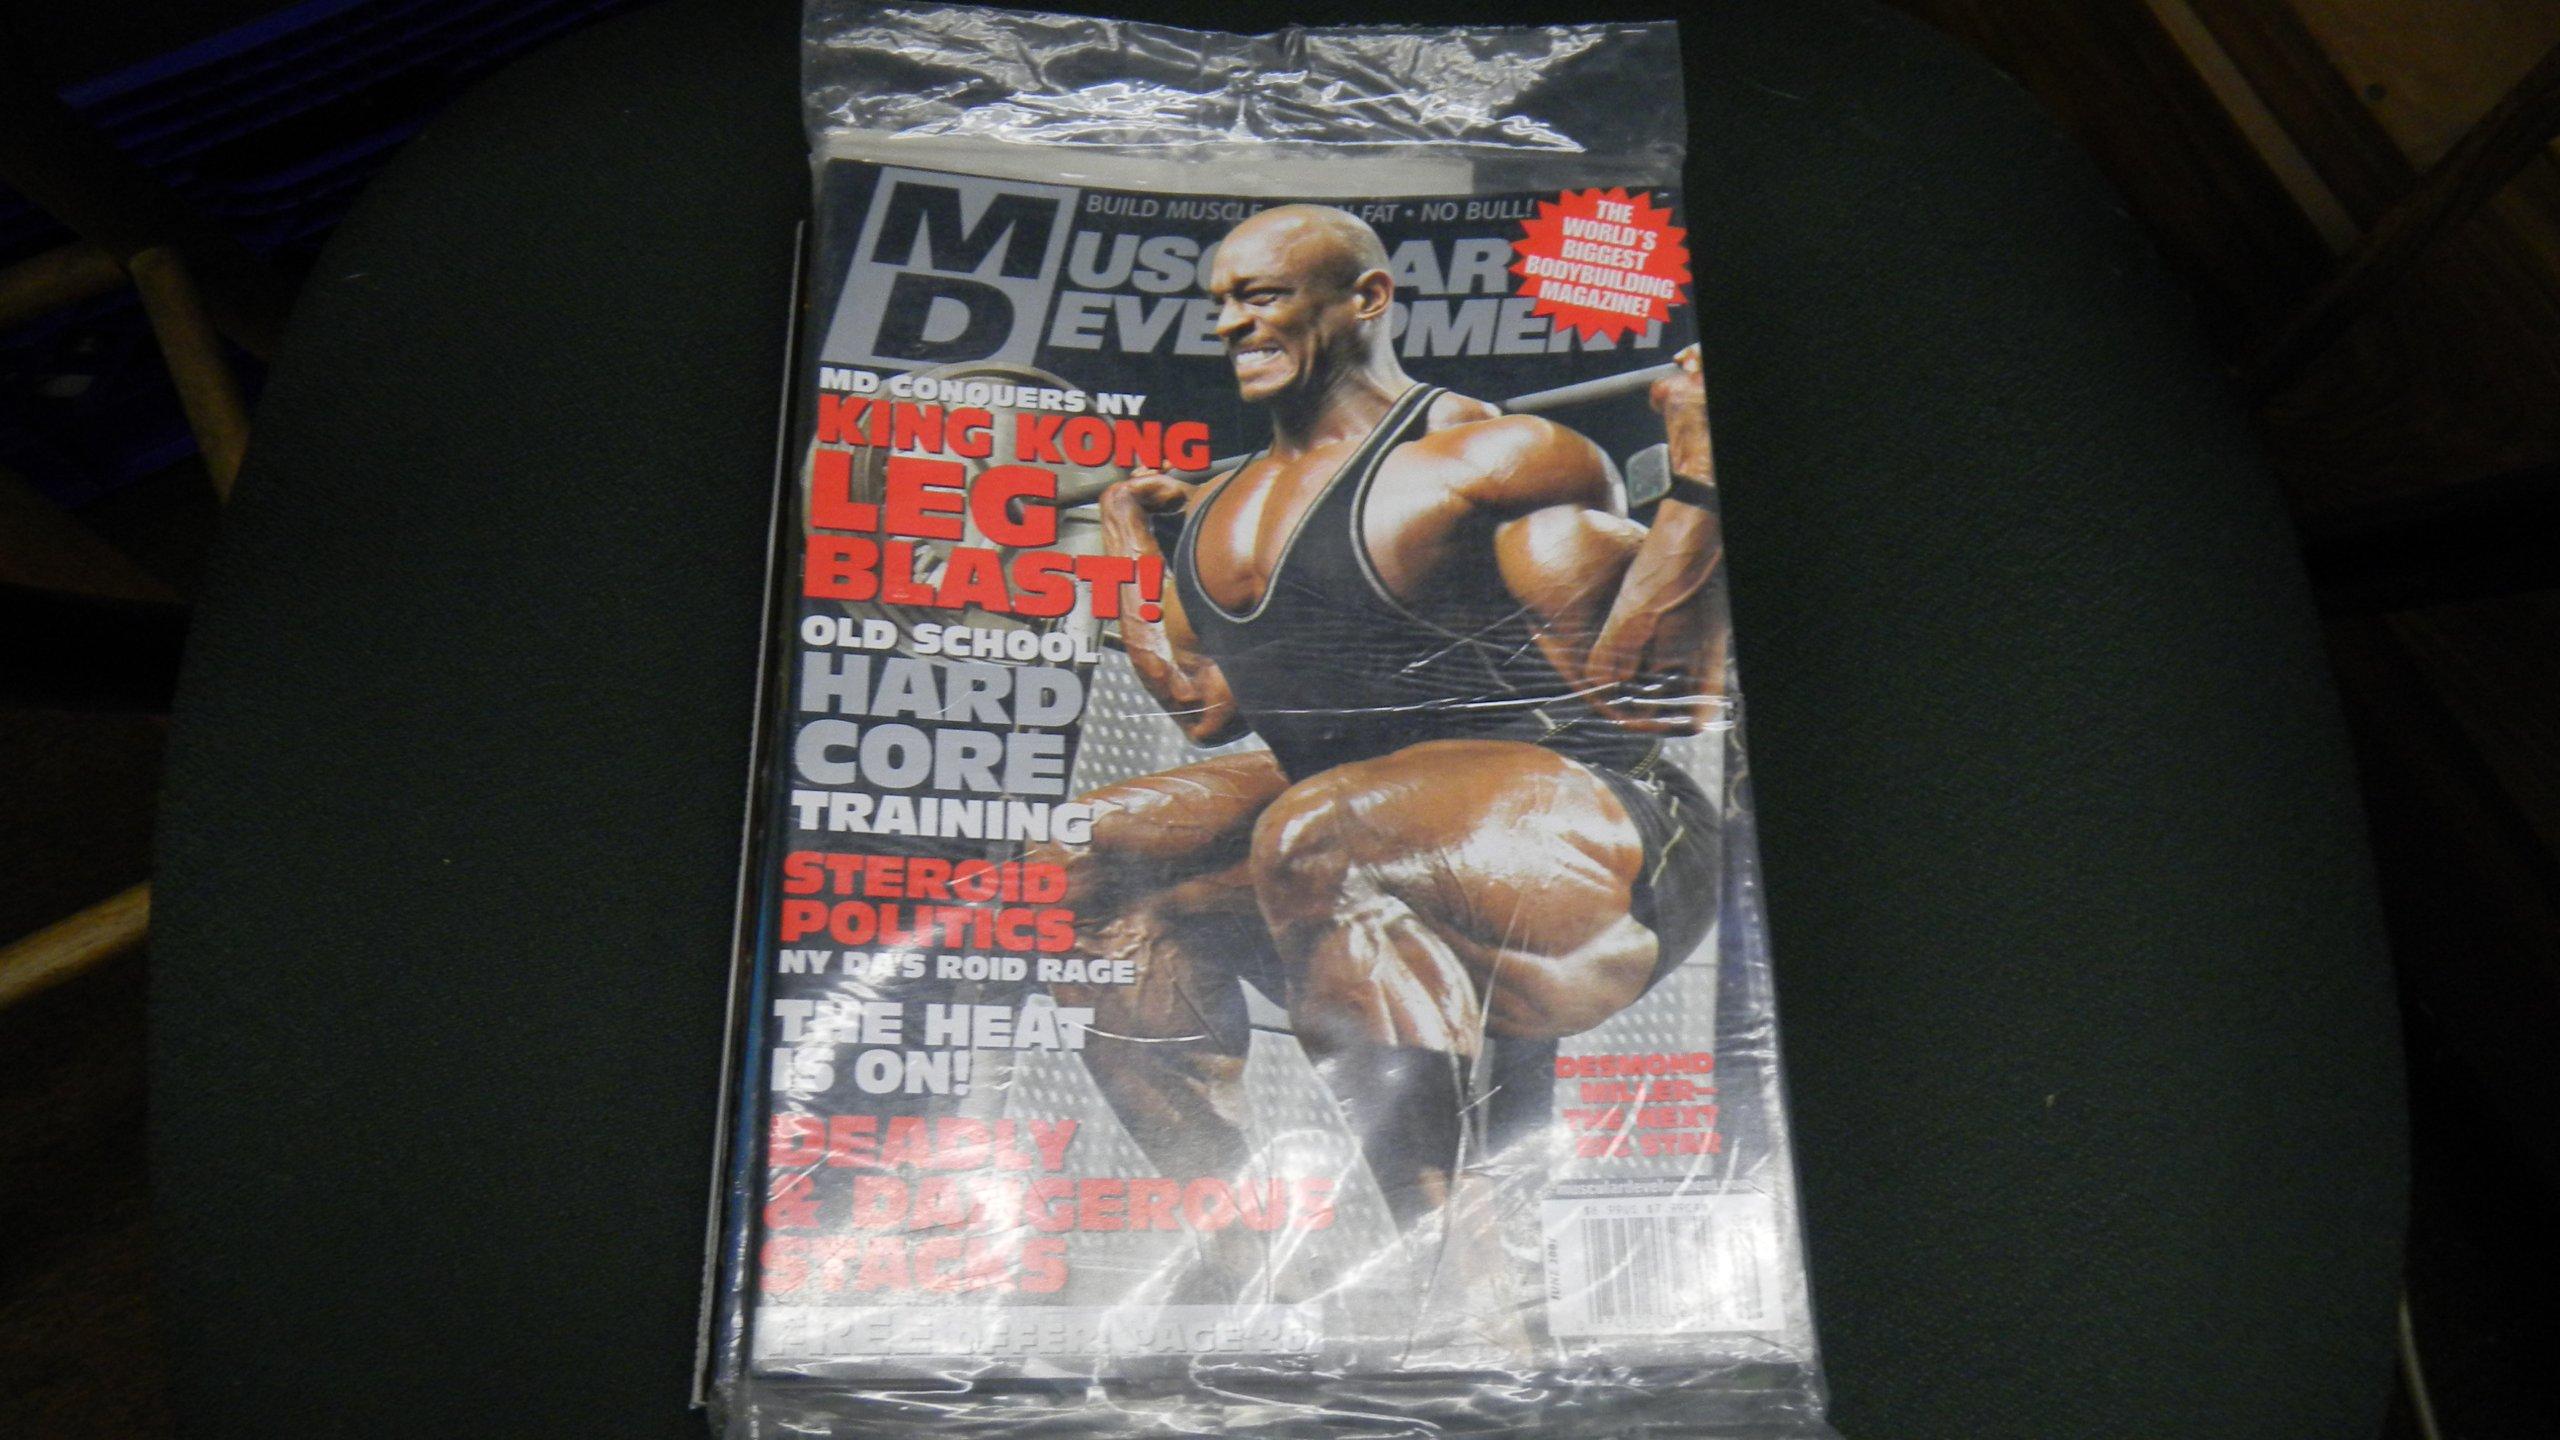 Muscular Development Magazine June 2007 King Kong Leg Blast and Hard